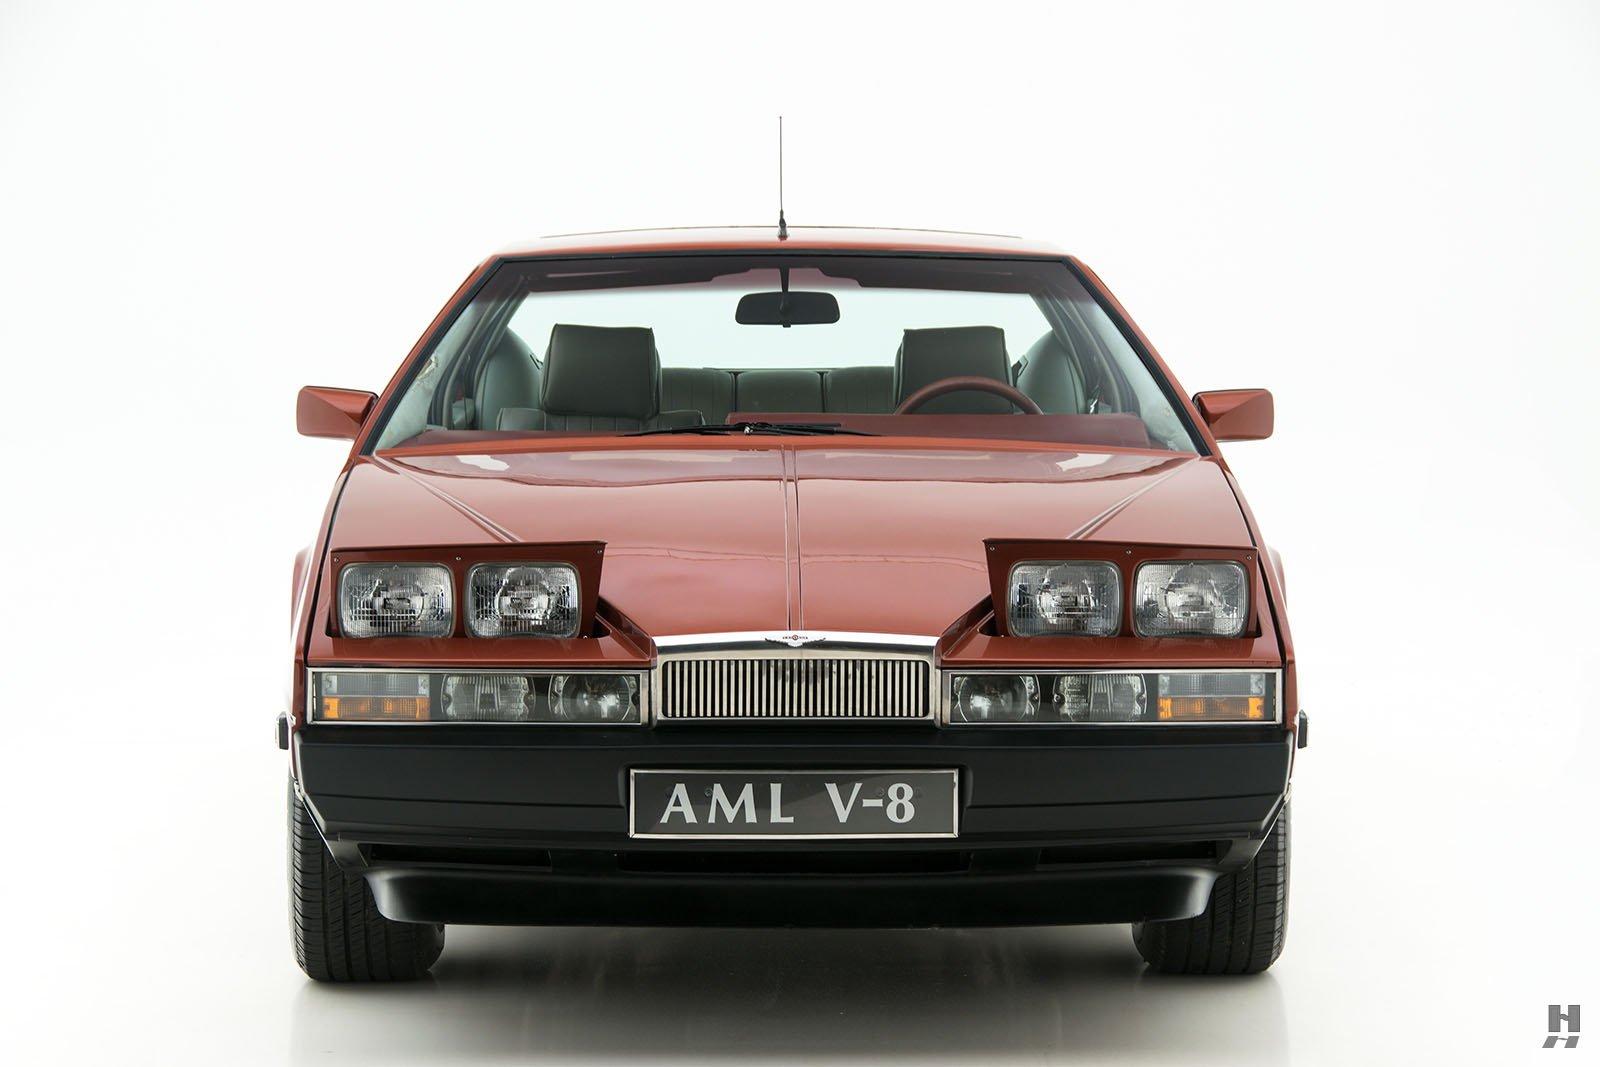 1985 aston martin lagonda saloon for sale buy classic cars hyman ltd. Black Bedroom Furniture Sets. Home Design Ideas